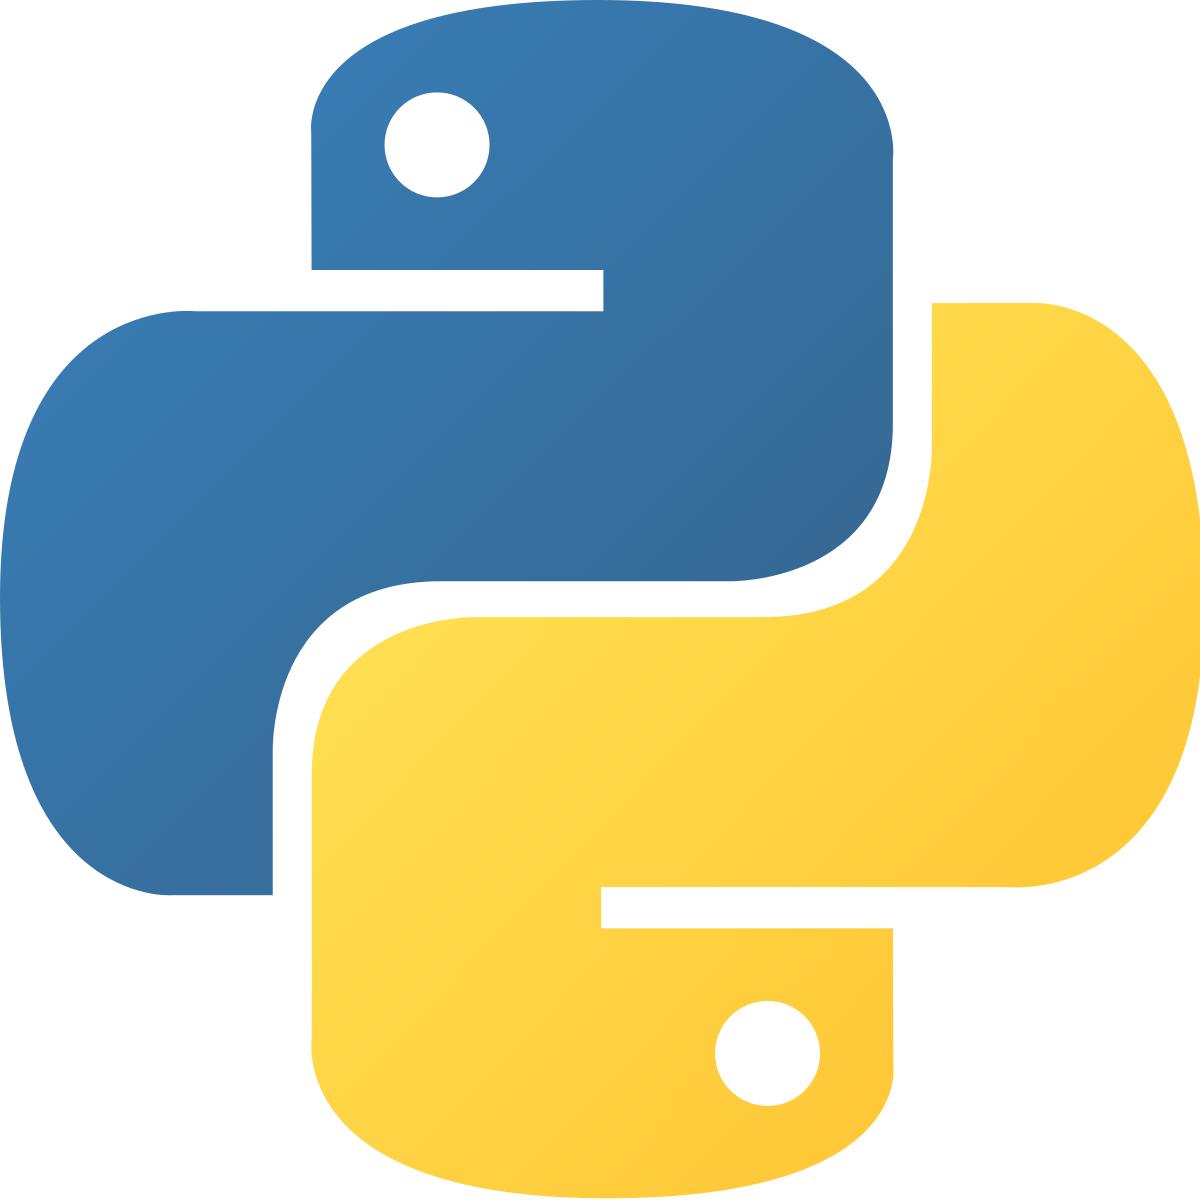 Curso de Python gratis (Inglés)